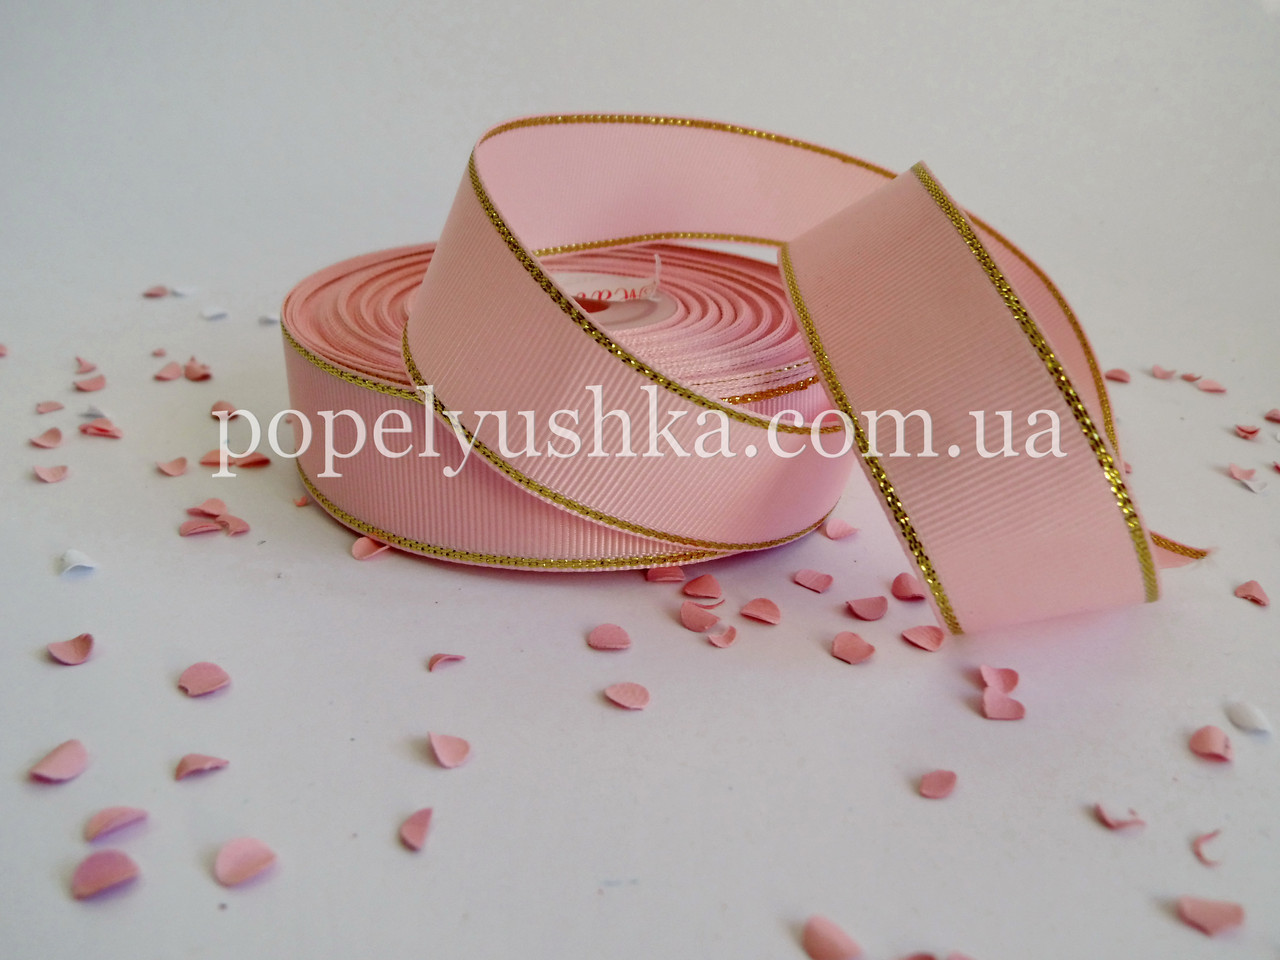 Стрічка репсова з золотим люрексом 2,5 см рожева